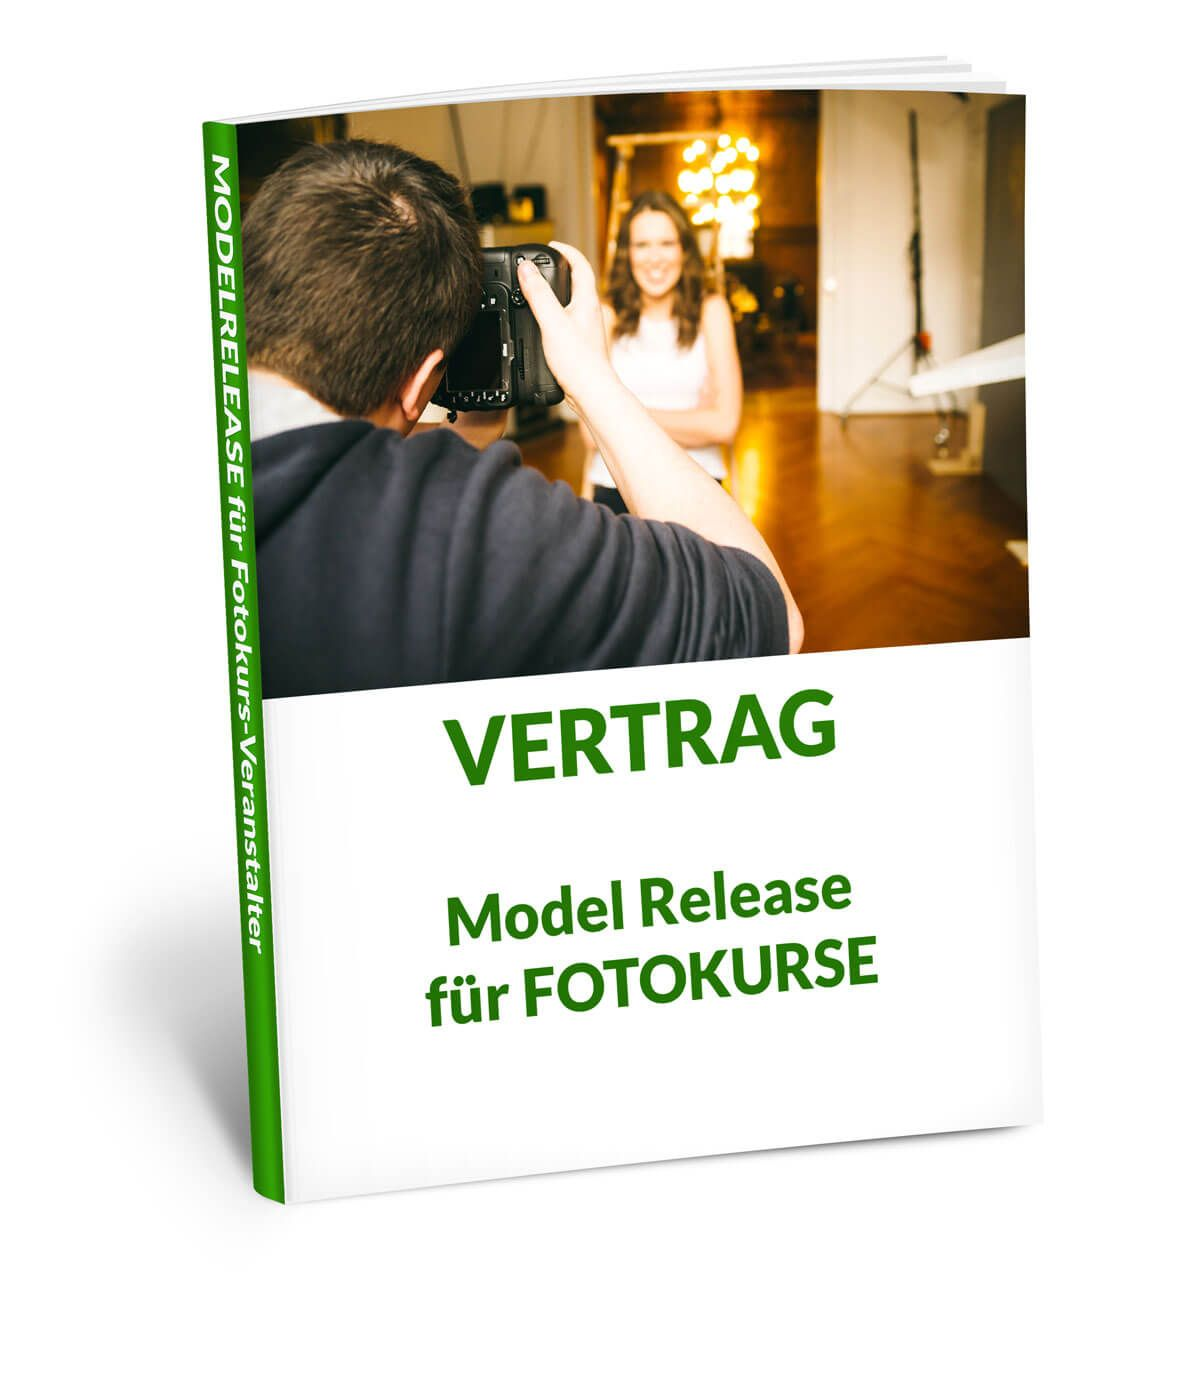 Model Release Vorlage Fur Fotokurse Diefotomanufaktur Fotostudio Winsen Fotokurs Hamburg Luneburg Winsen Photobooth Hamburg Models Fotostudio Fotos